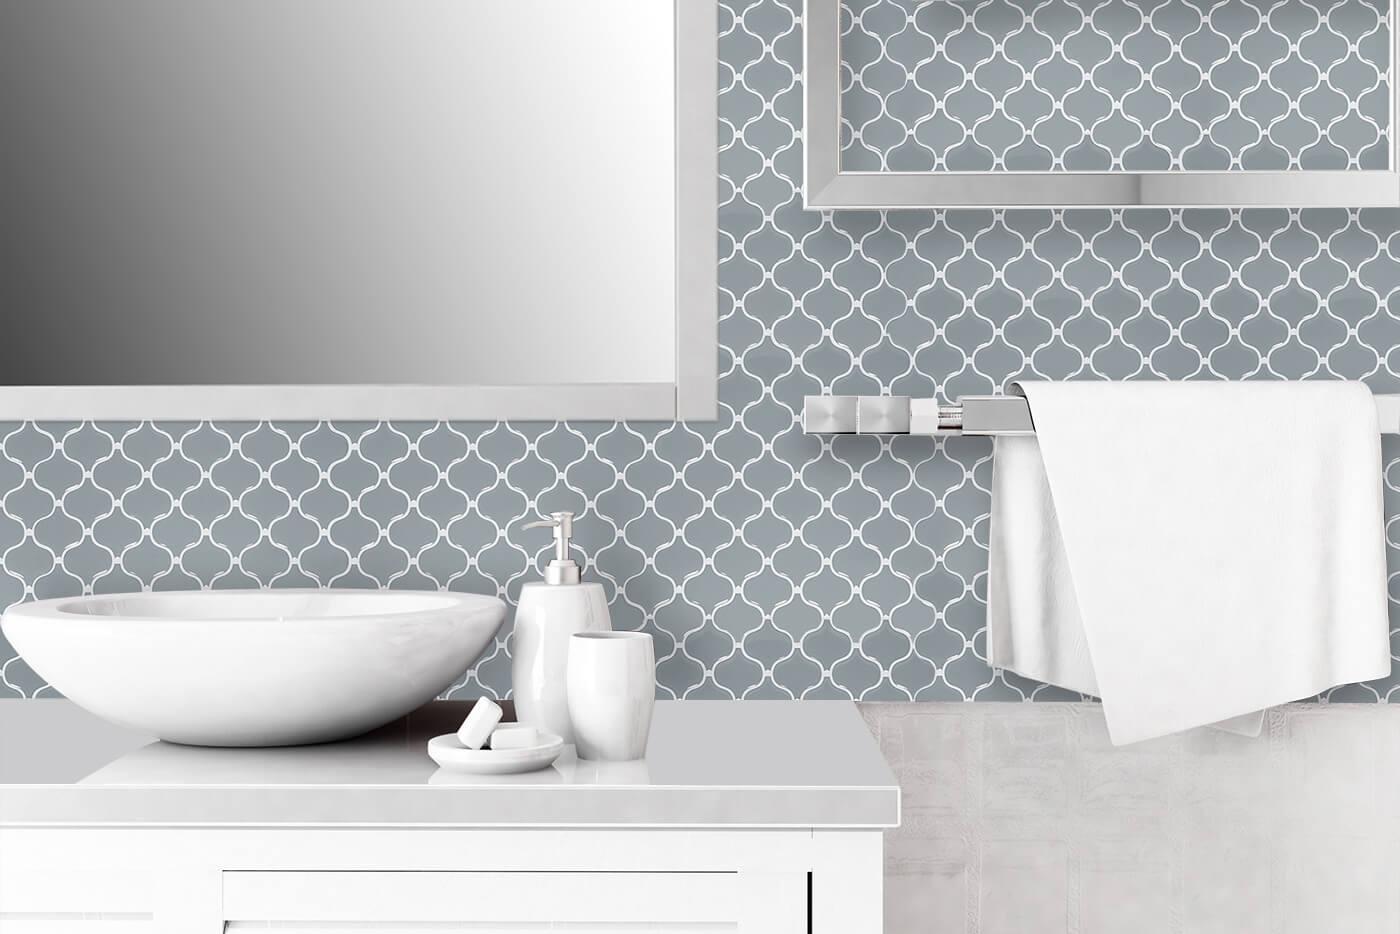 bathroom backsplash ideas with peel and stick gray lantern mosaic tiles